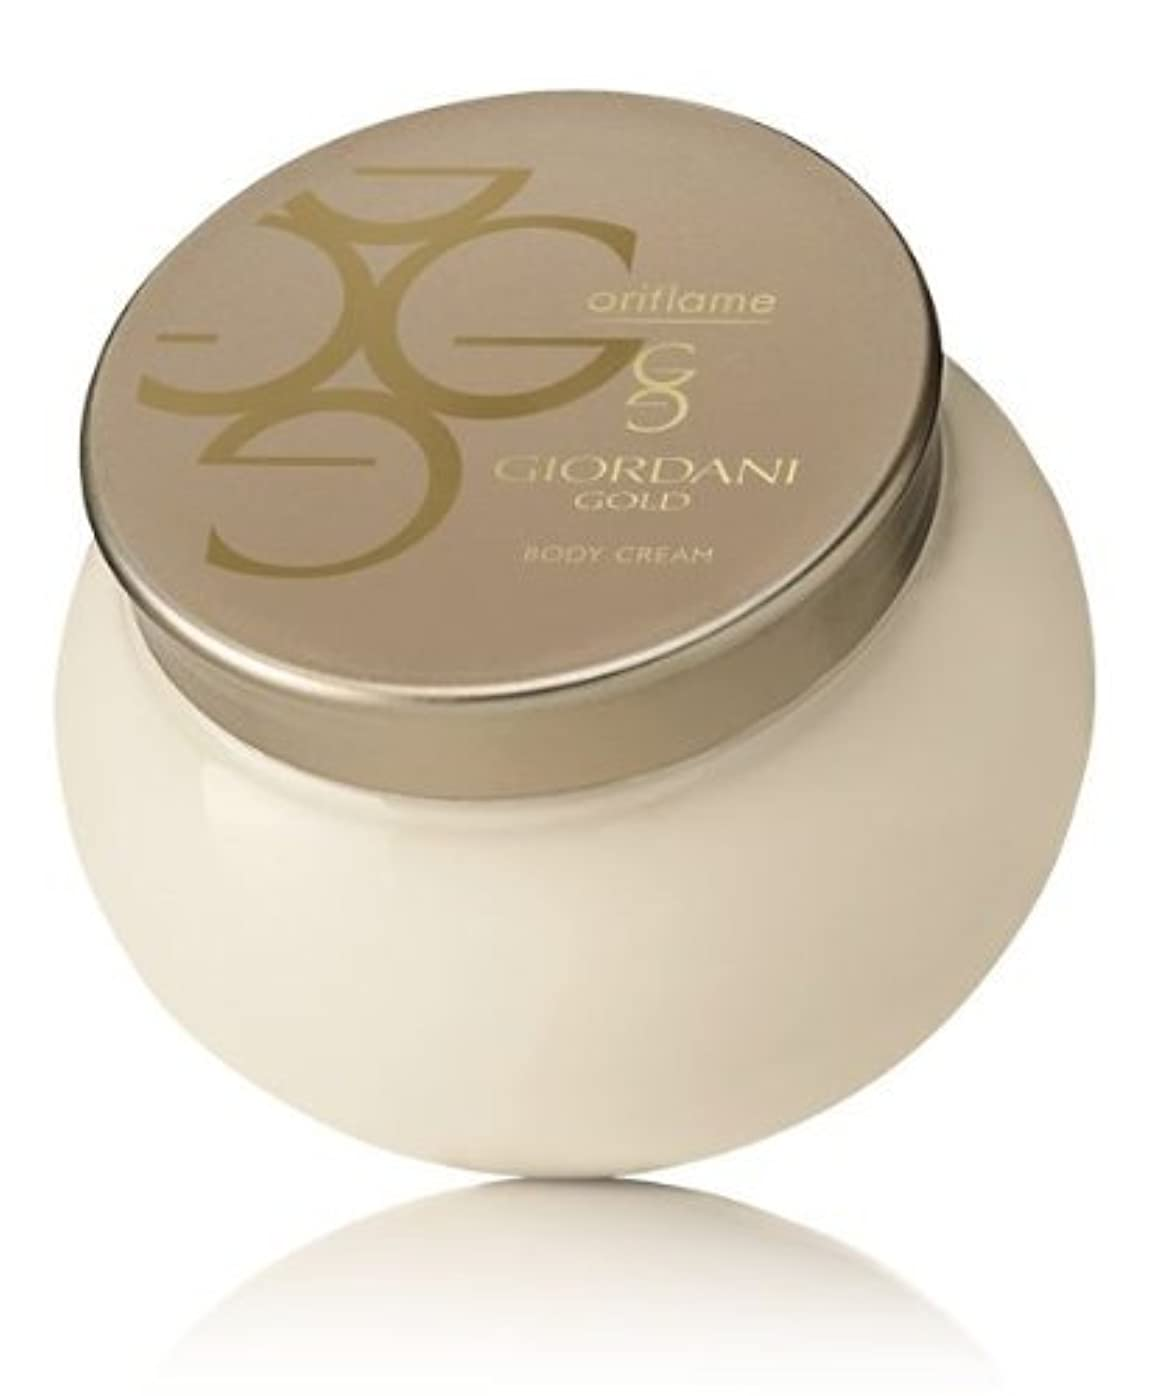 機械的に脱獄著作権Giordani Gold Body Cream by Oriflame